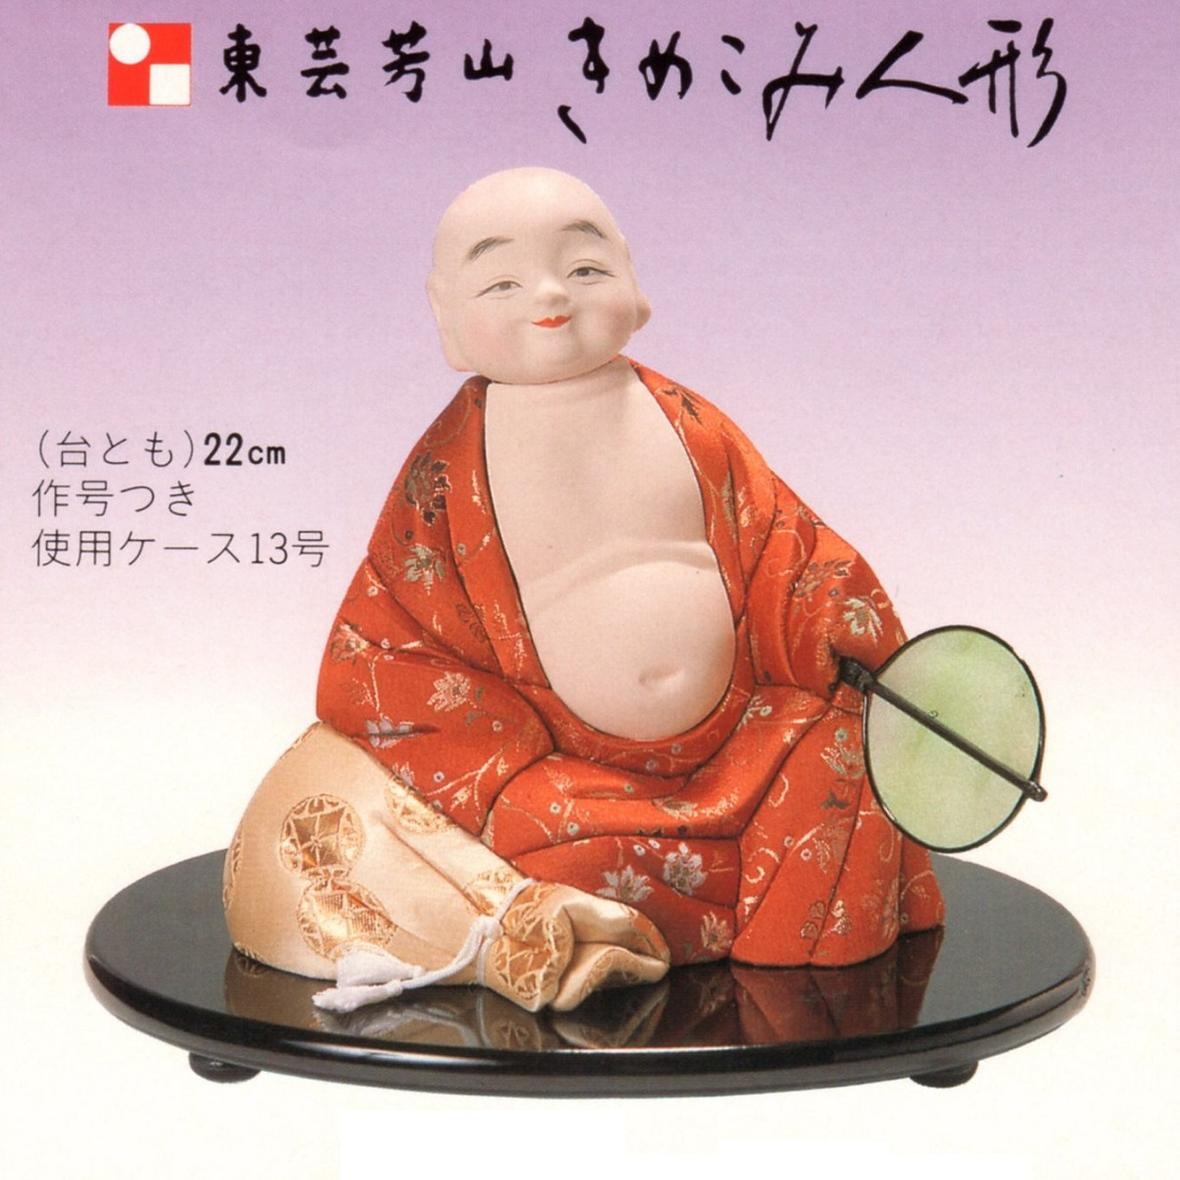 東芸 木目込人形キット「開運七福神・布袋」 K712-13